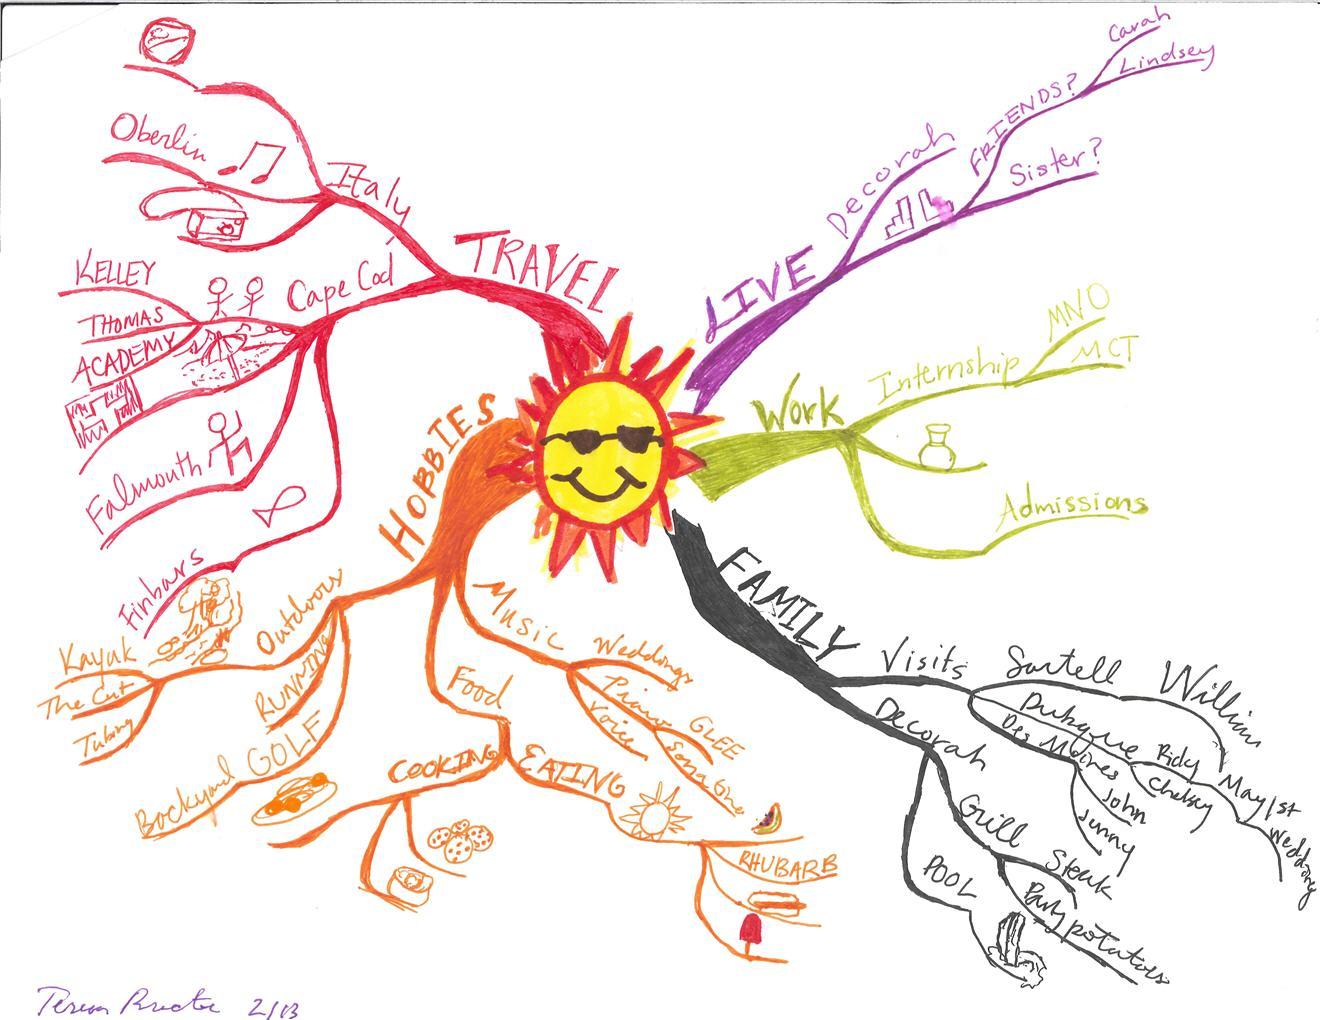 http://4.bp.blogspot.com/-h9mZtoQ63gM/TkDzTw9OO5I/AAAAAAAAAjs/PPyz34FB42I/s1600/Teresa-Procter-Idea-Map-or-Mind-Map-of-Summer-Plans.jpg